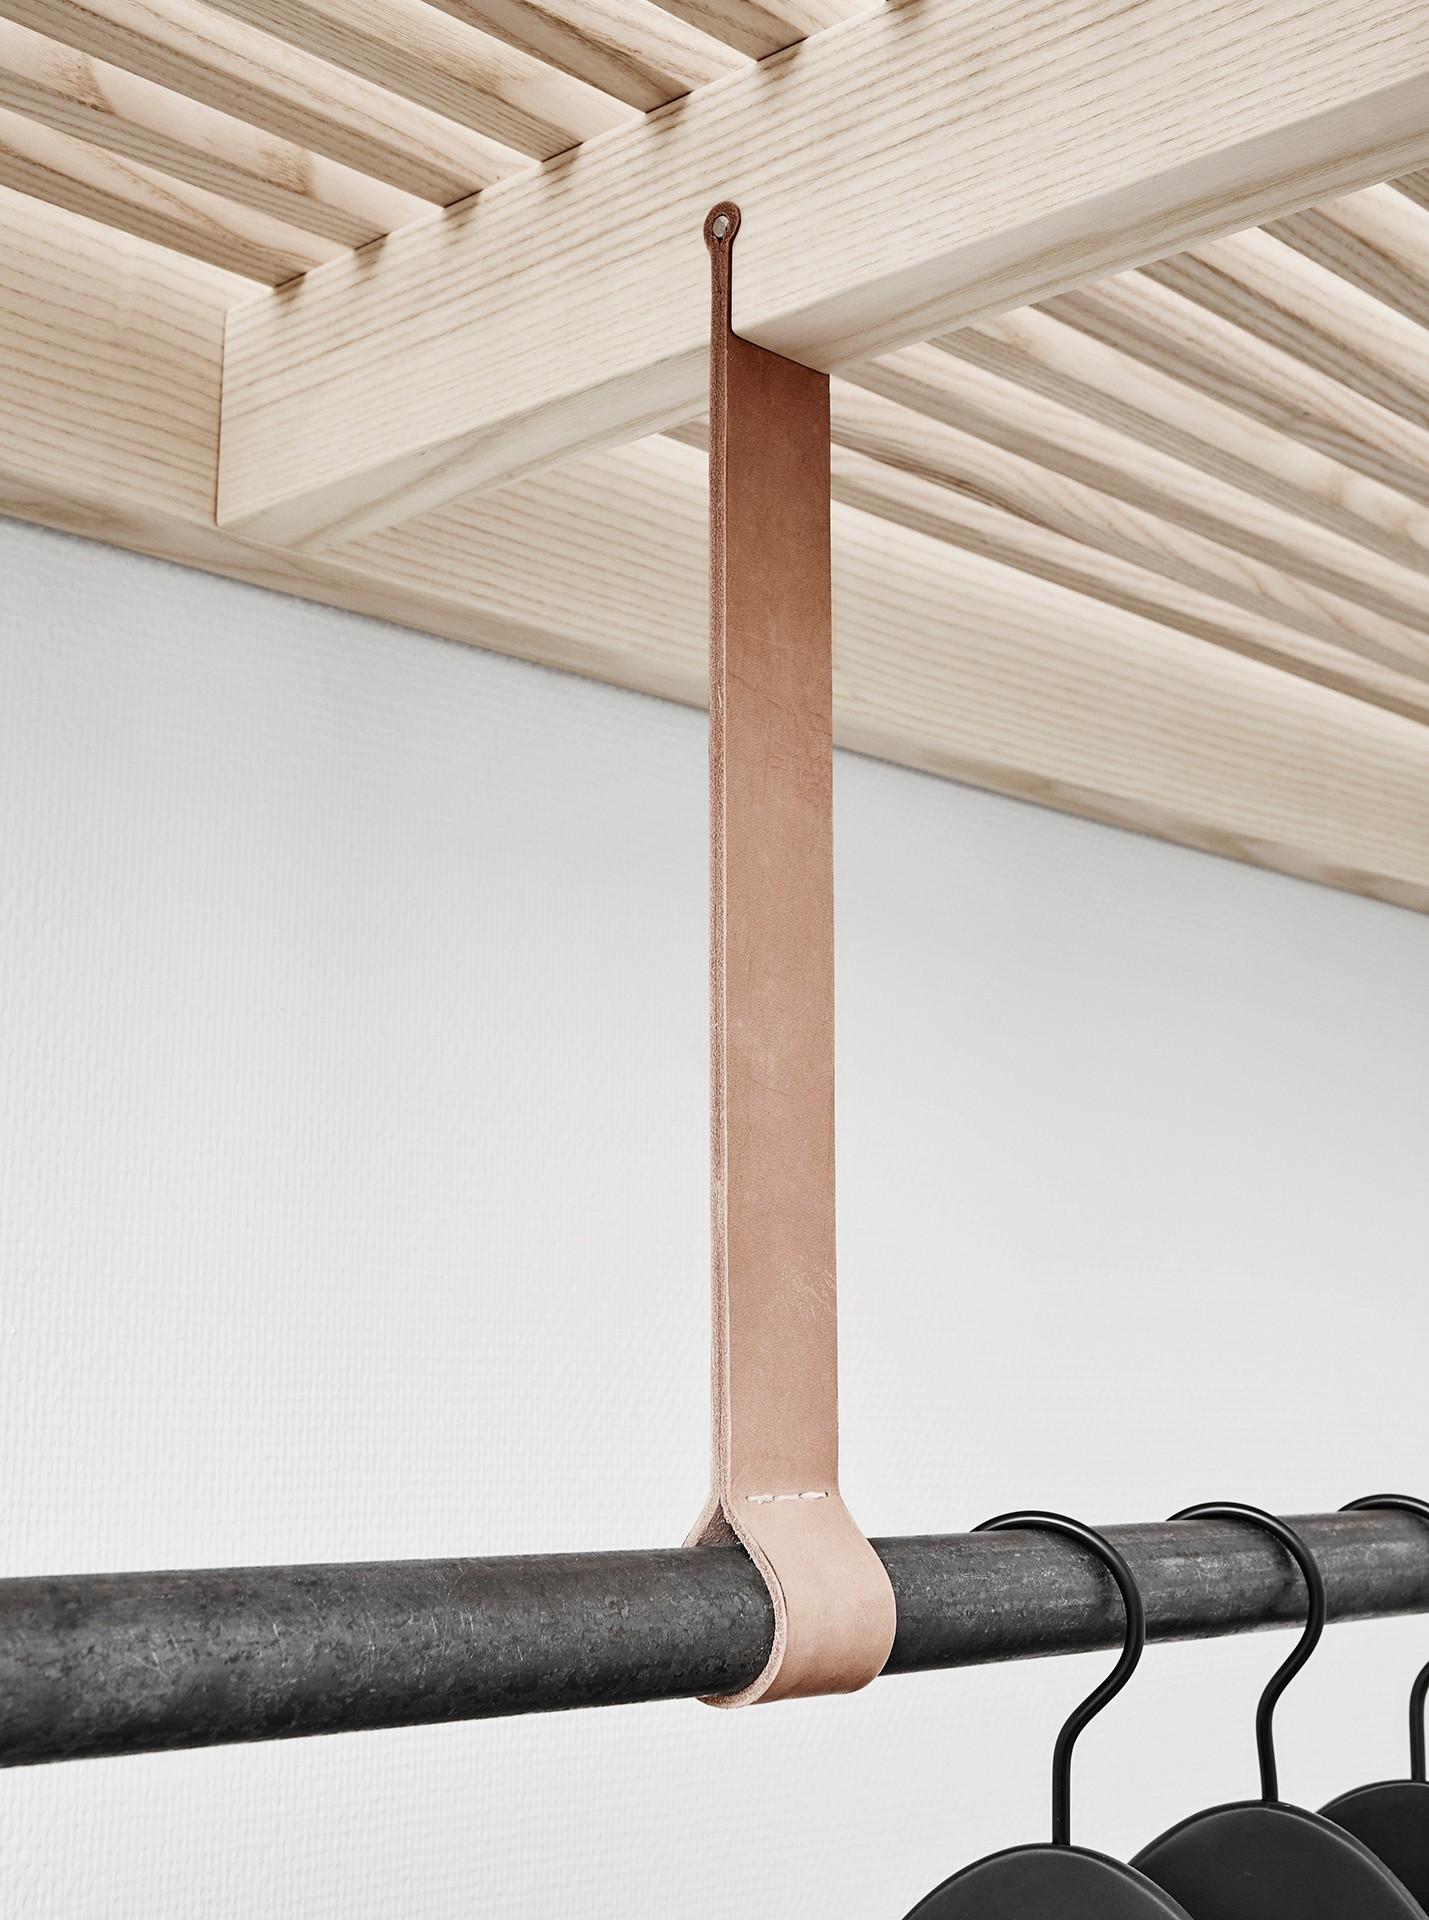 sofie-ladefoged-interior-favrskov-gymnasium-03.jpg